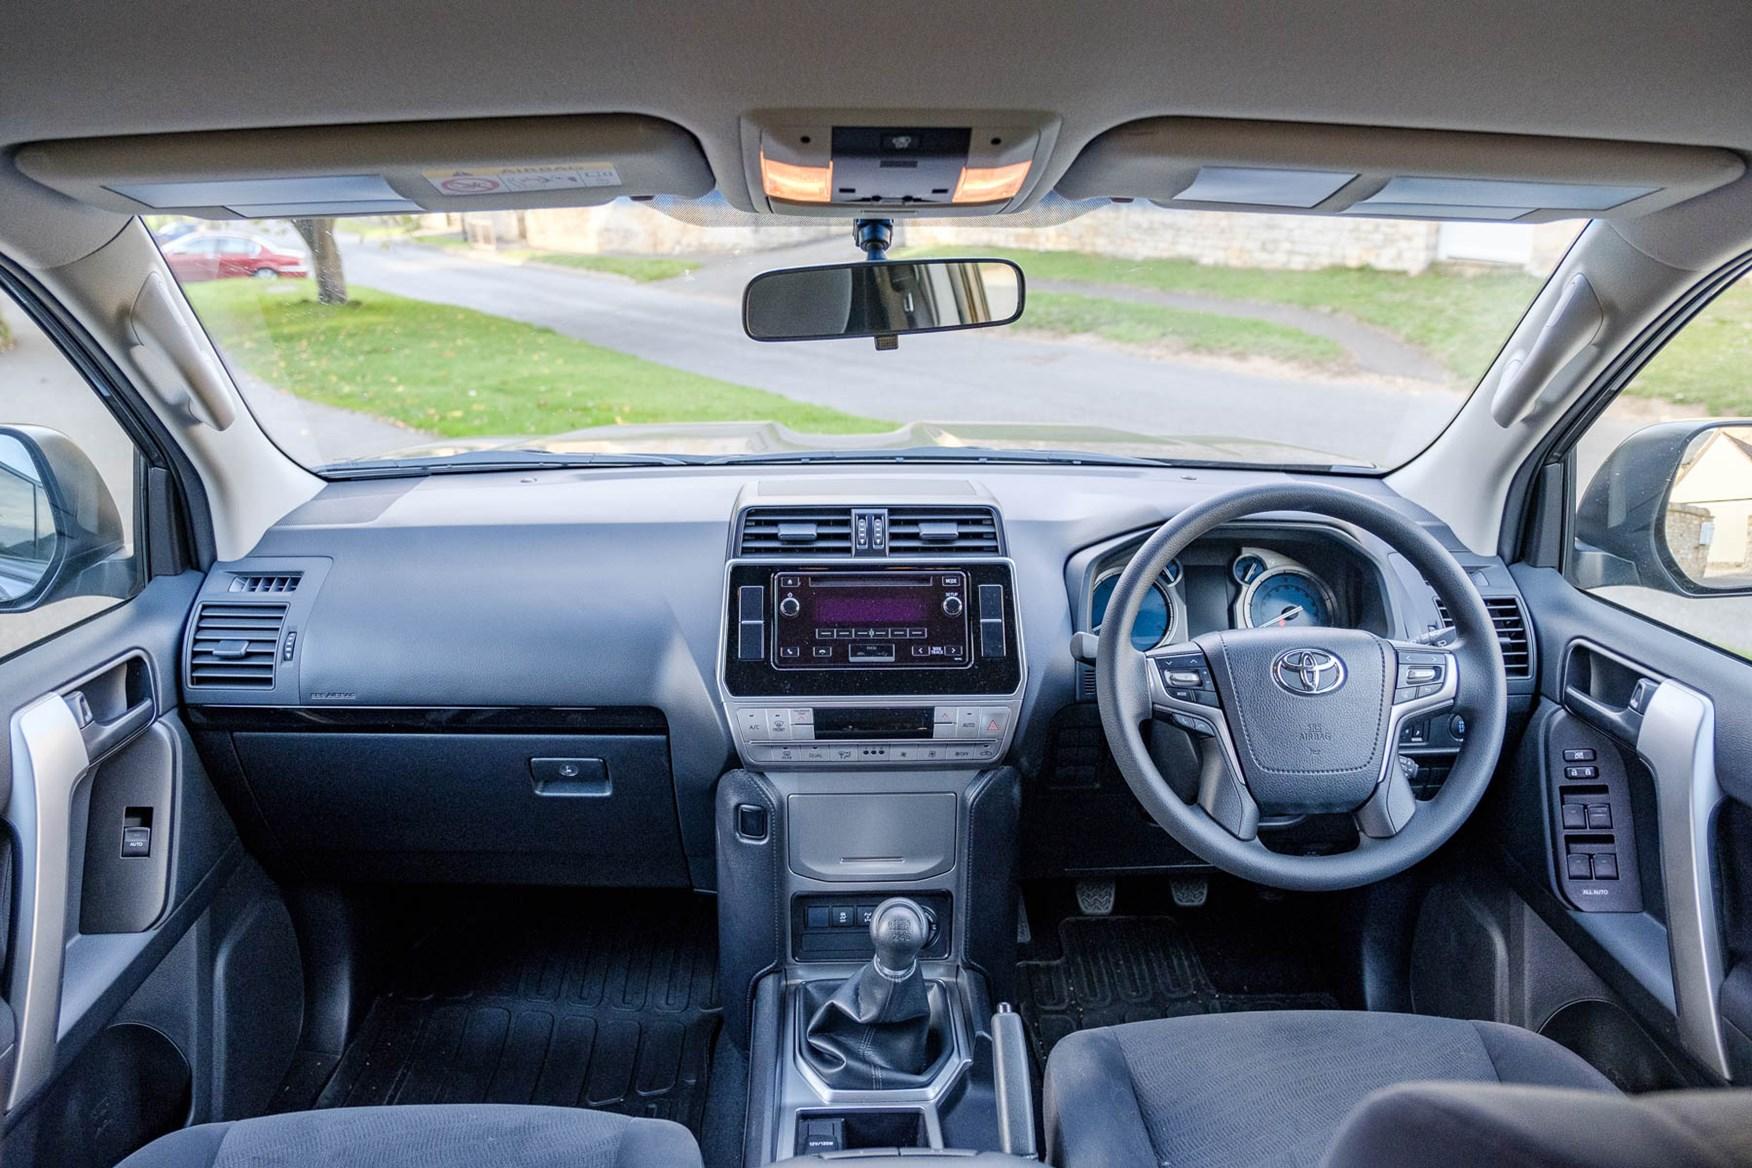 Toyota Land Cruiser Utility dashboard